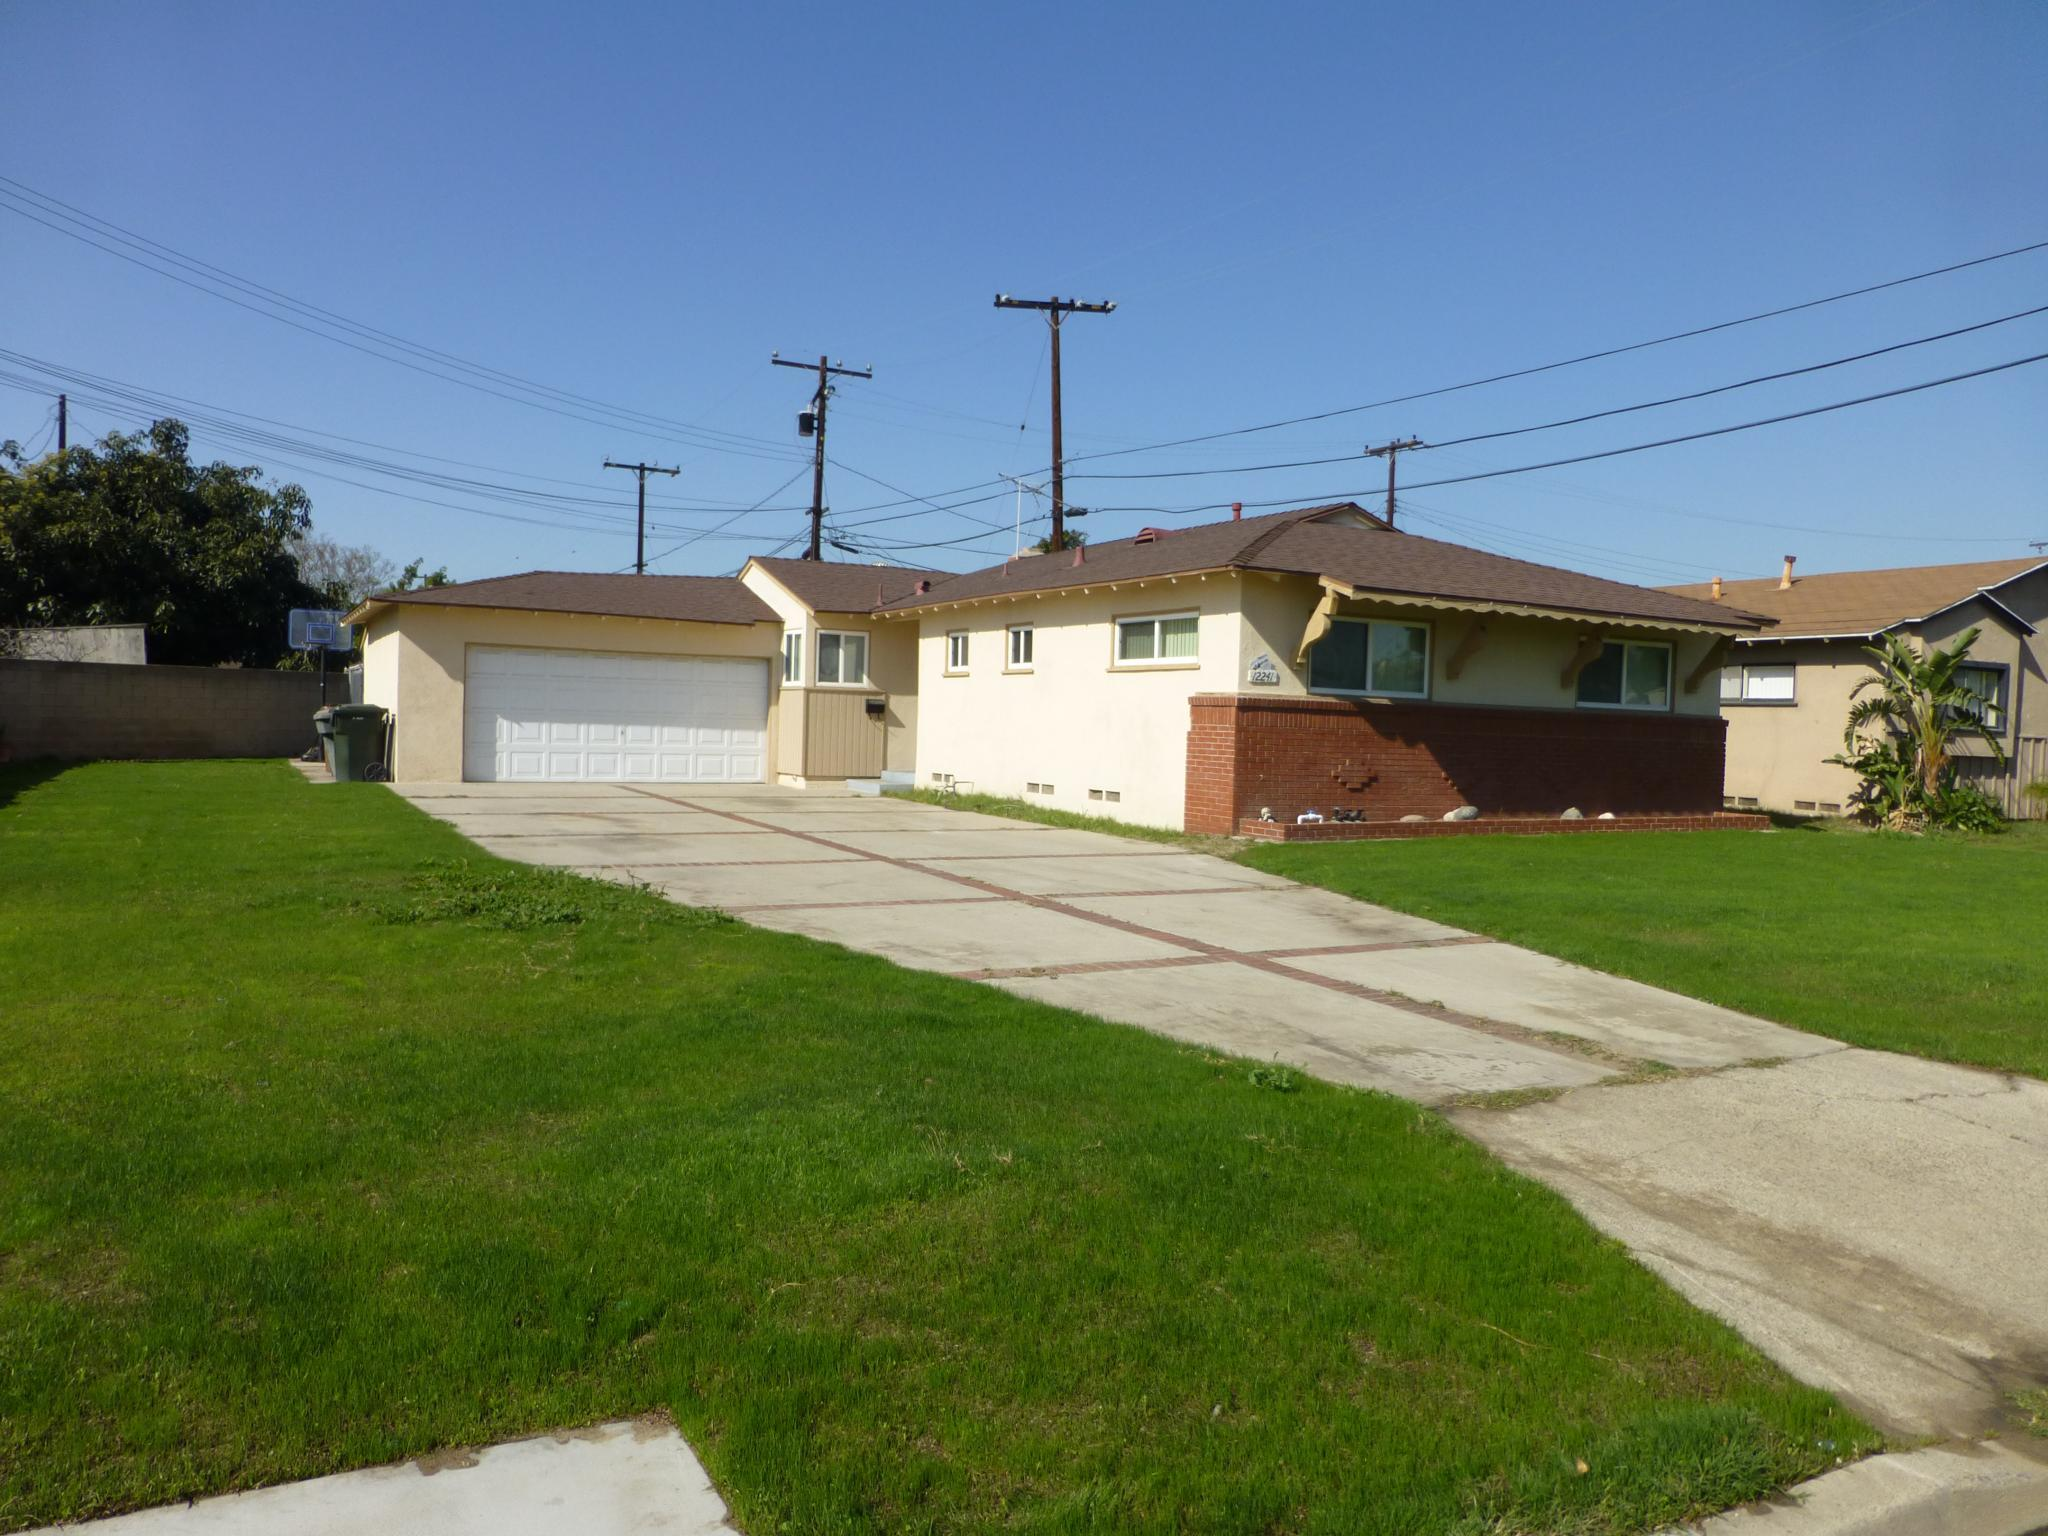 12241 Bangor St For Rent - Garden Grove, CA | Trulia